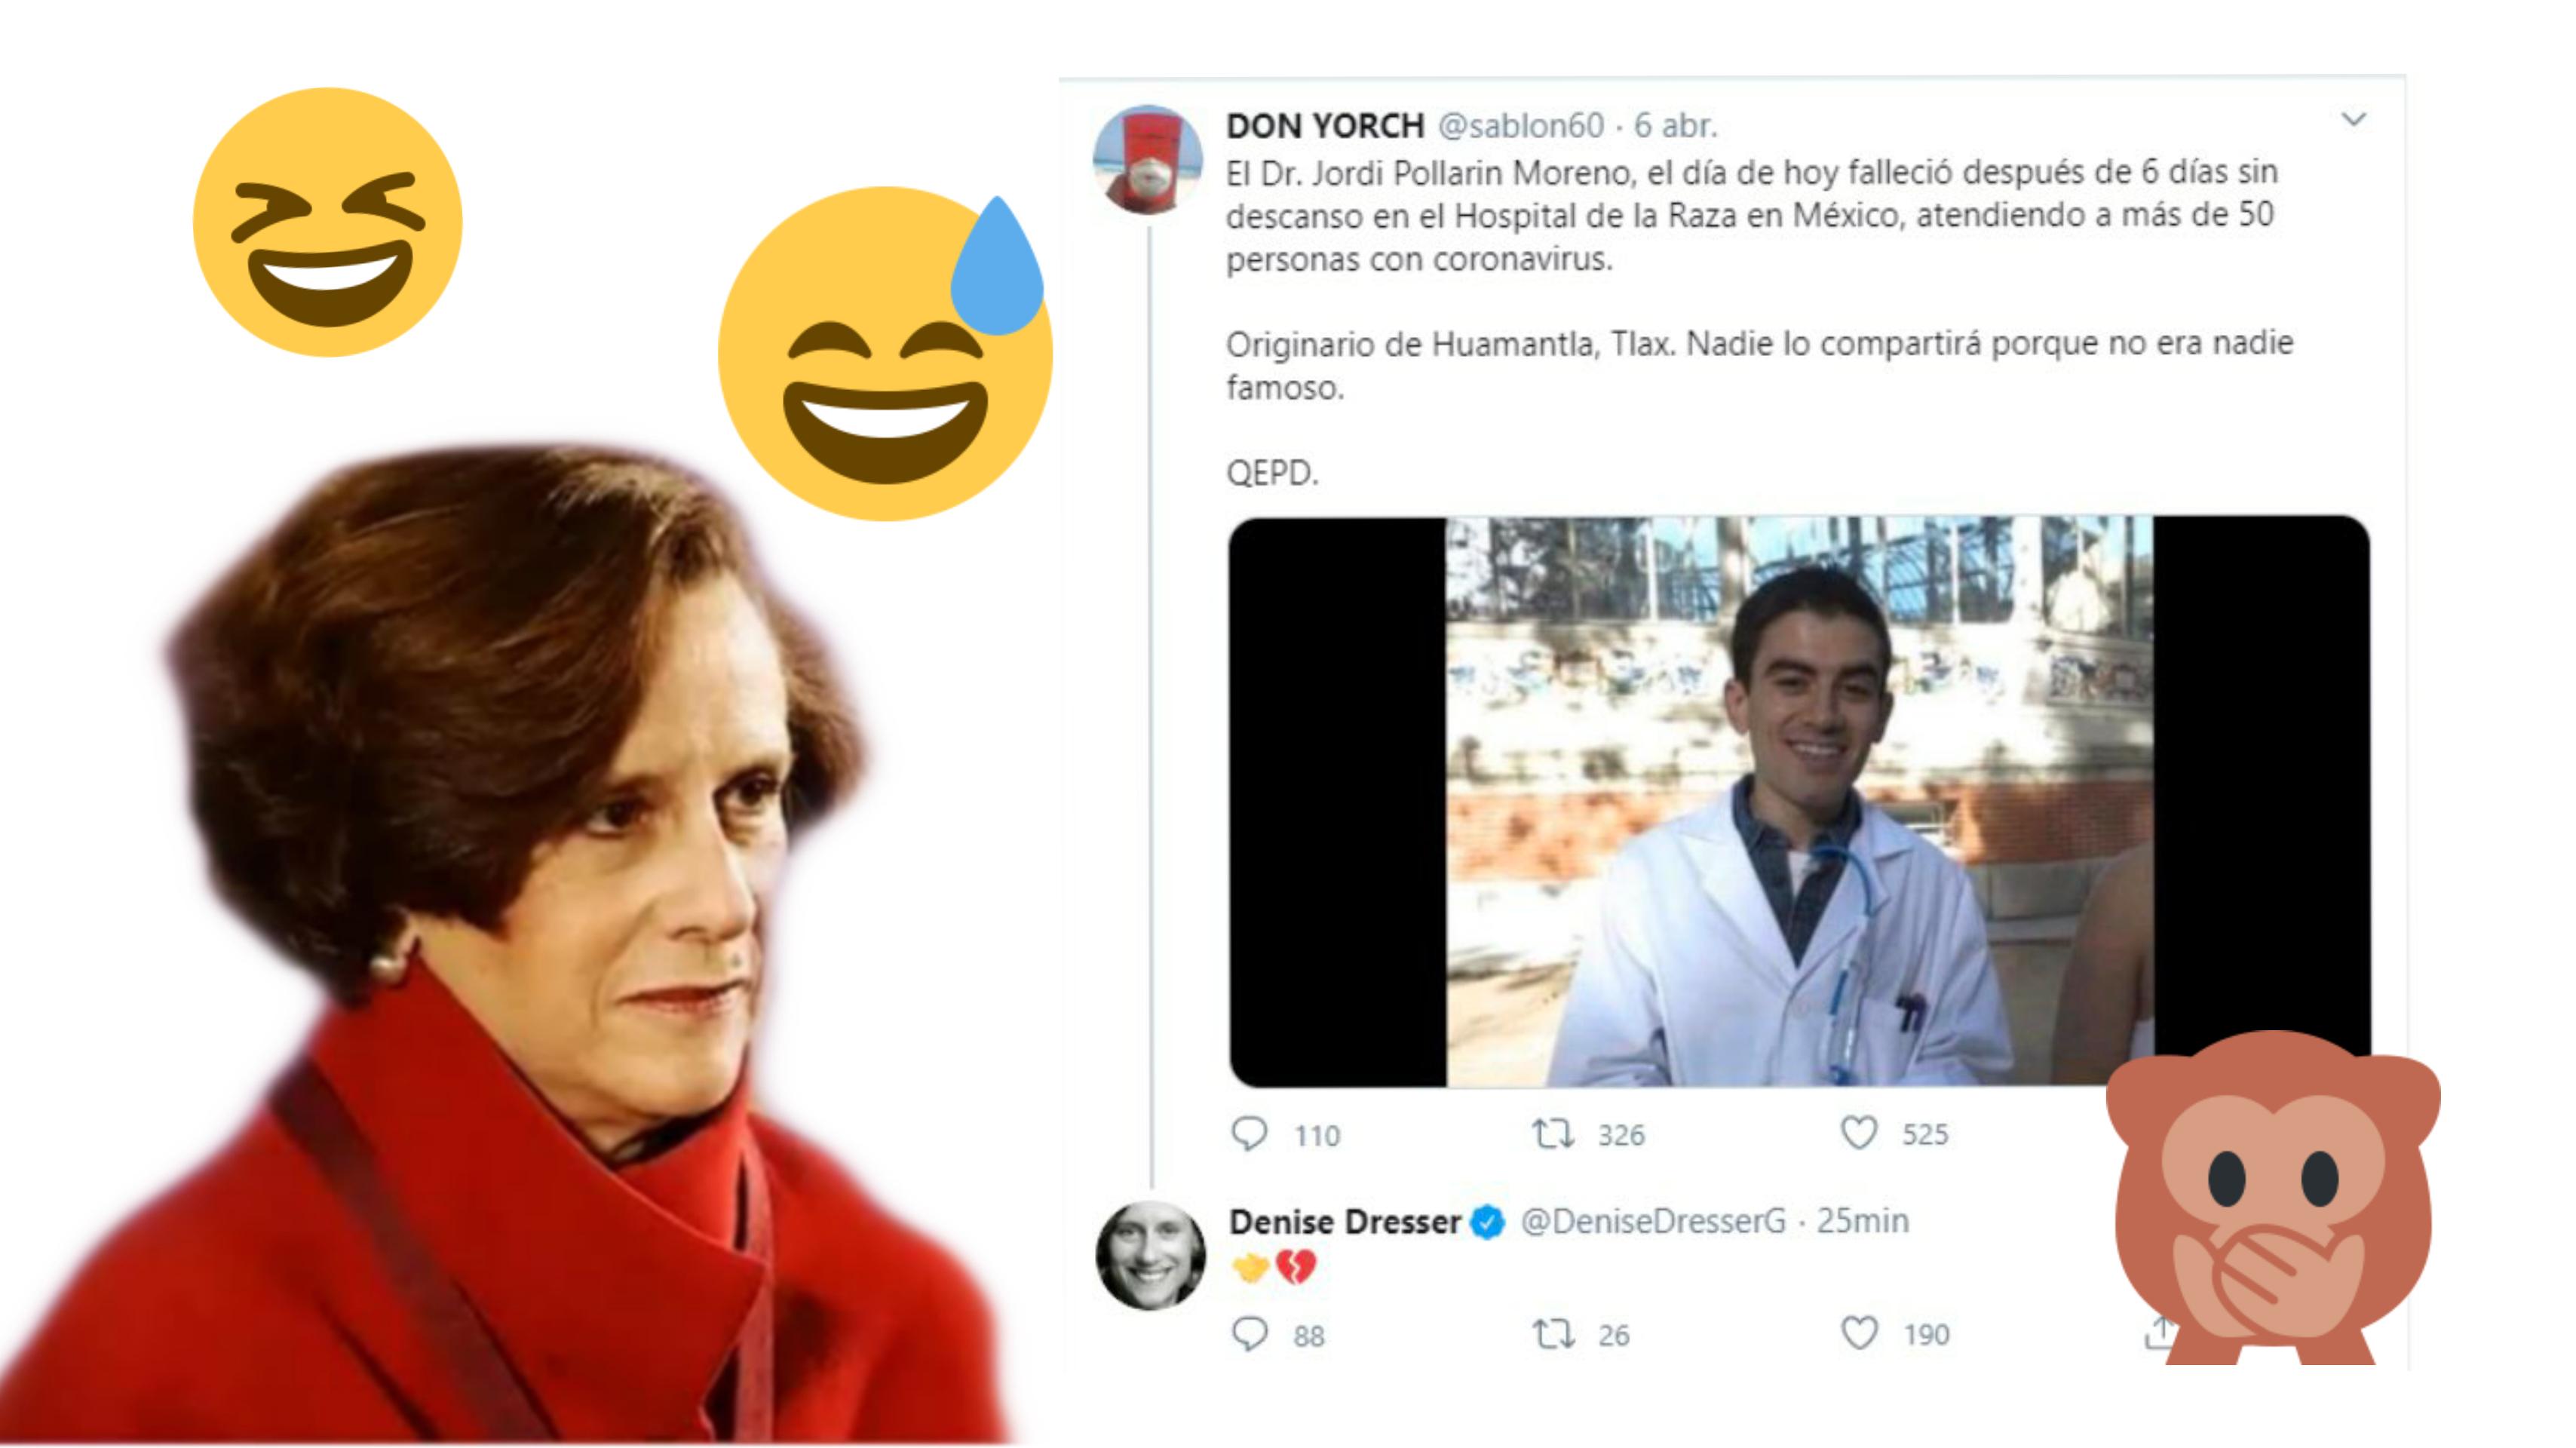 Actor Porno Famoso Español otra vez denise dresser! confunde actor porno con médico